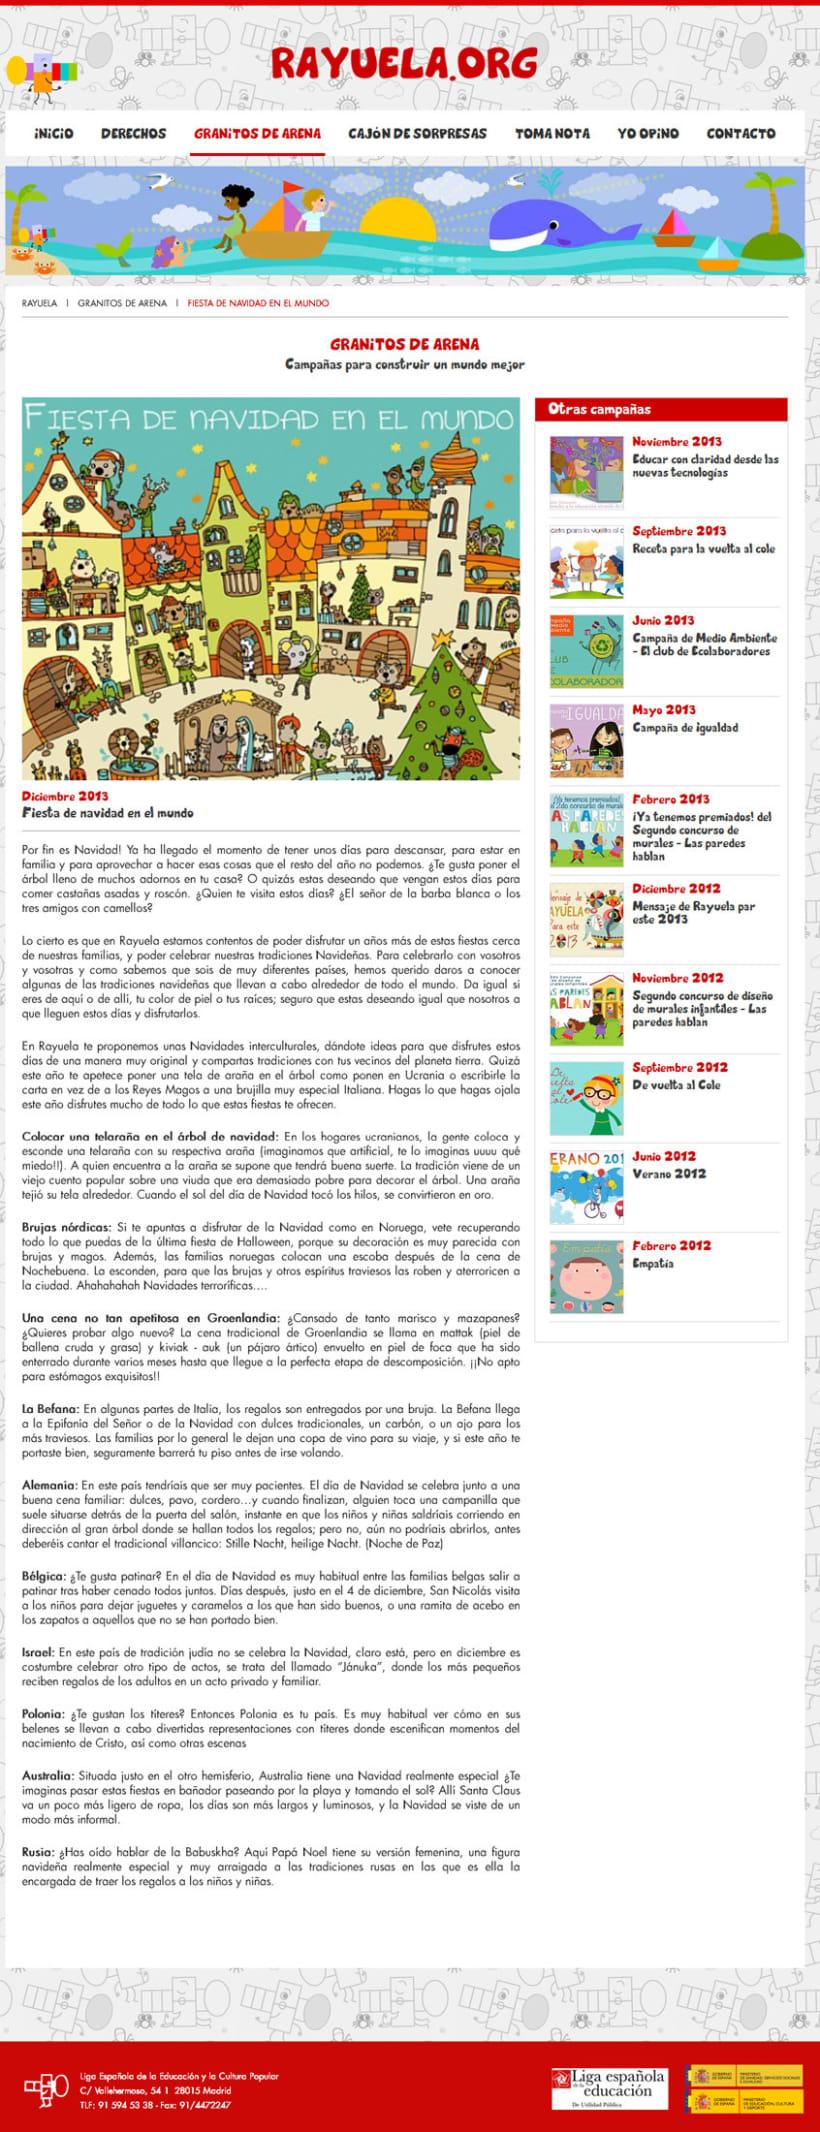 xHTML + CSS + jQuery + PHP + CMS (Gestor de Contenidos) - Rayuela 1